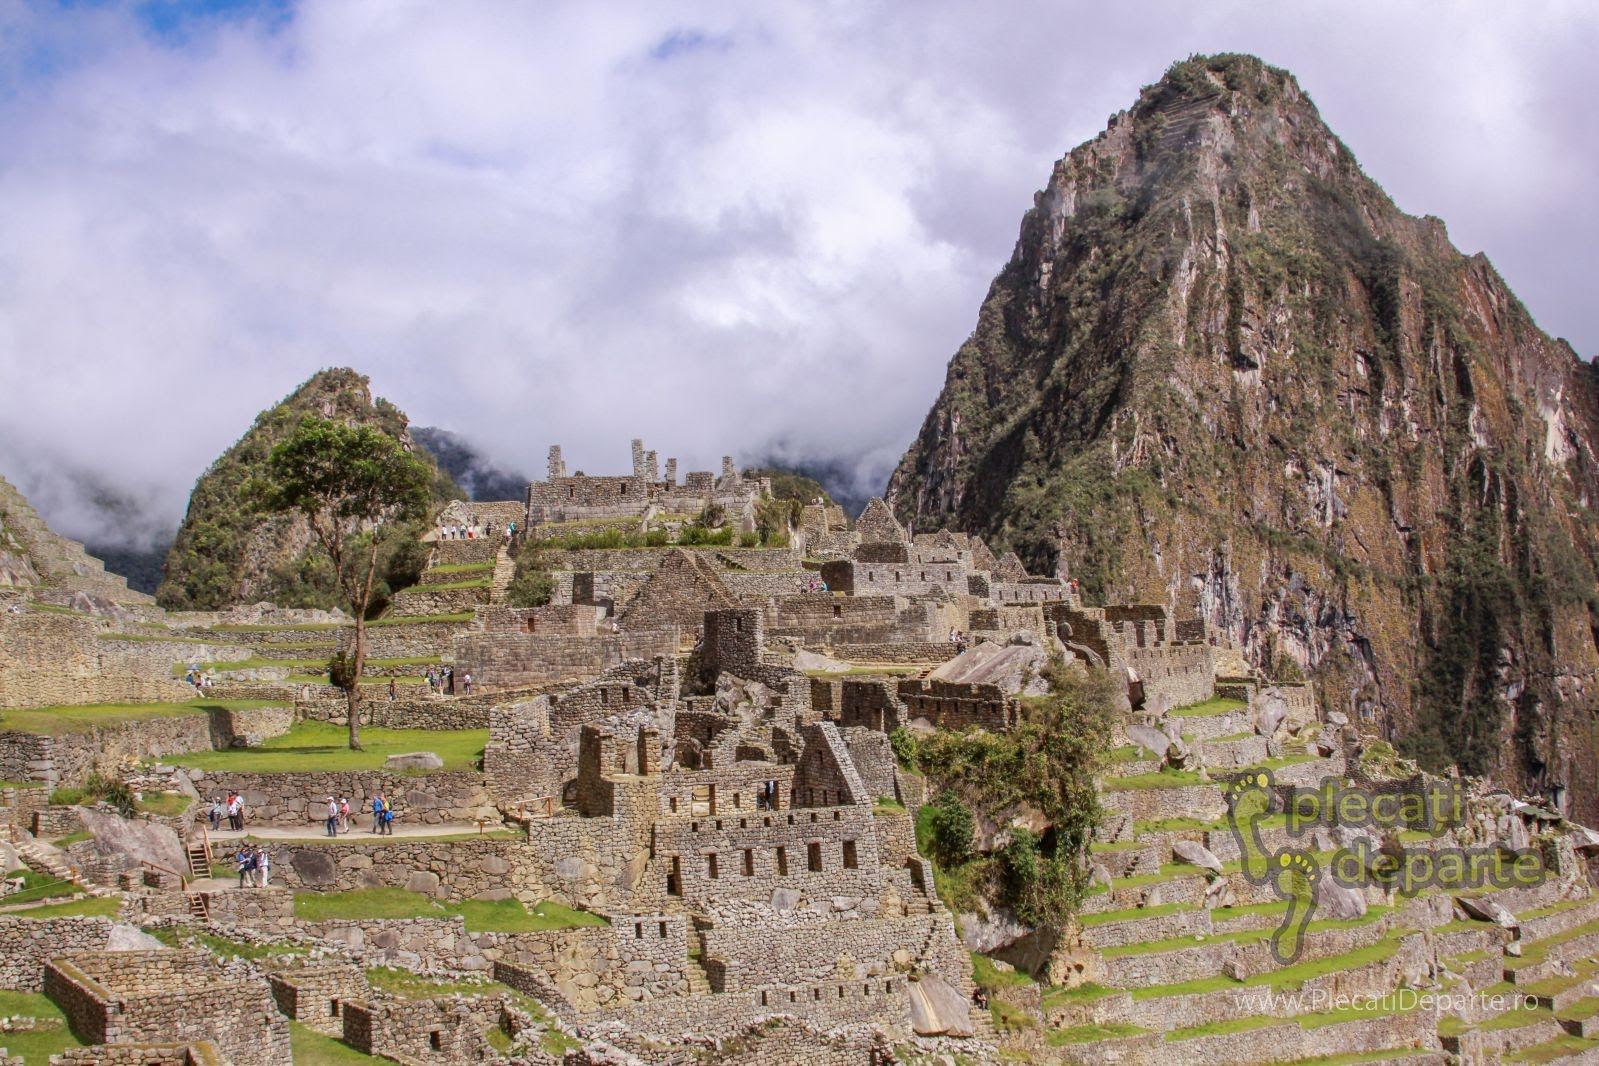 ruine ale orasului Machu Picchu